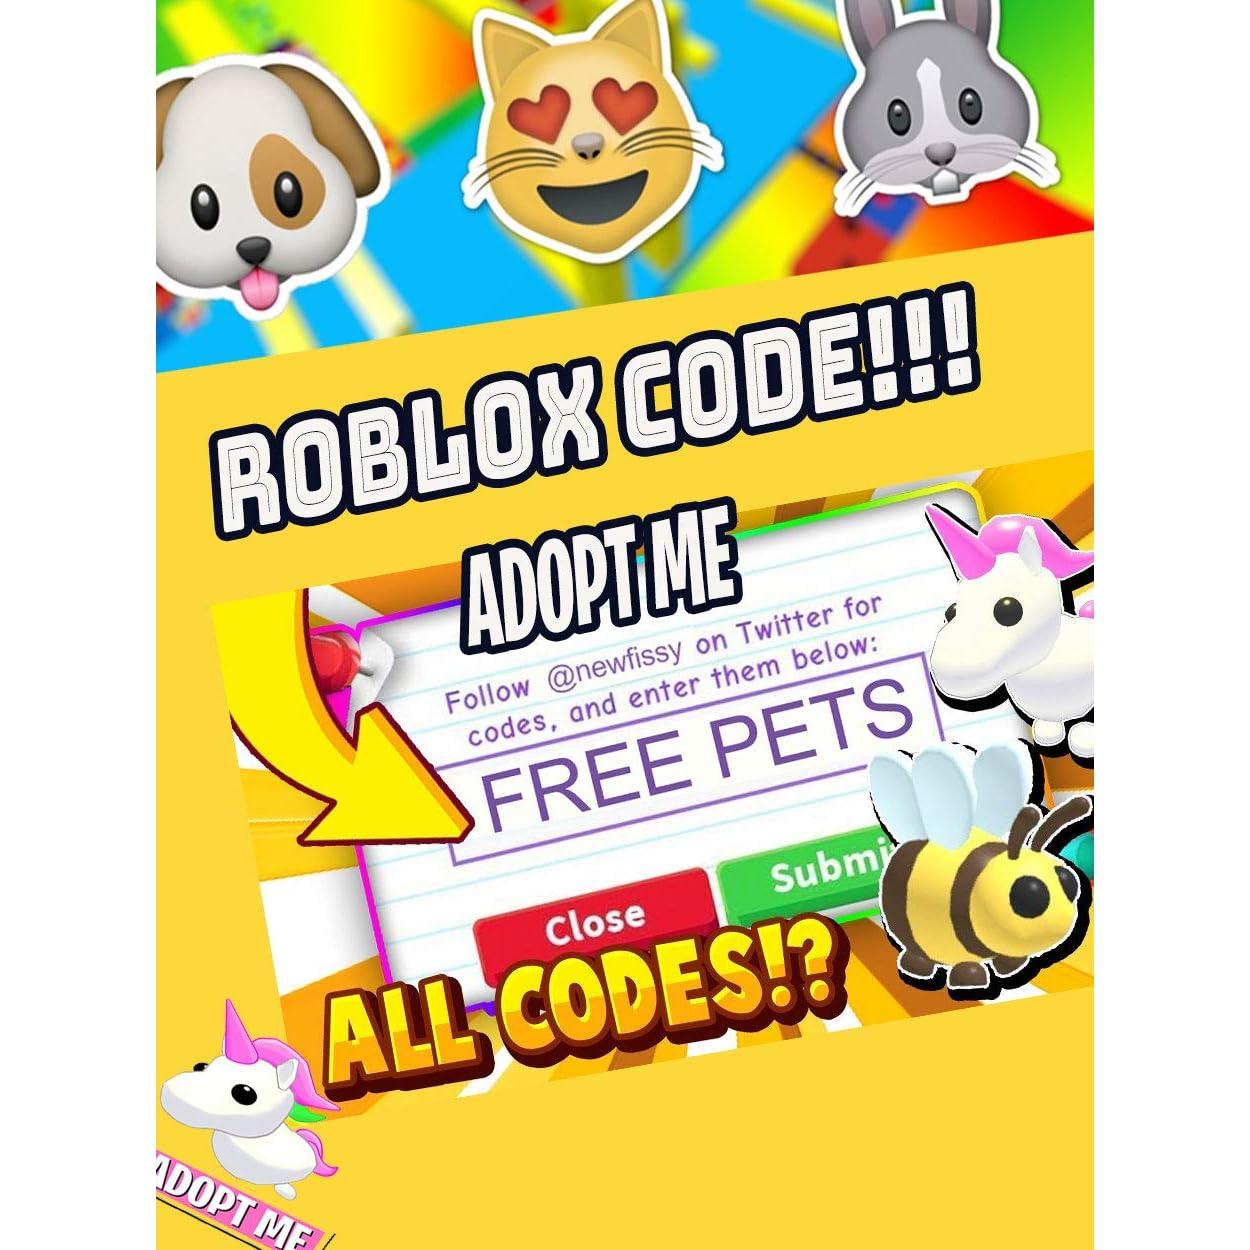 Roblox Adopt Me Full Adopt Me Code List Guide By Jules Pub